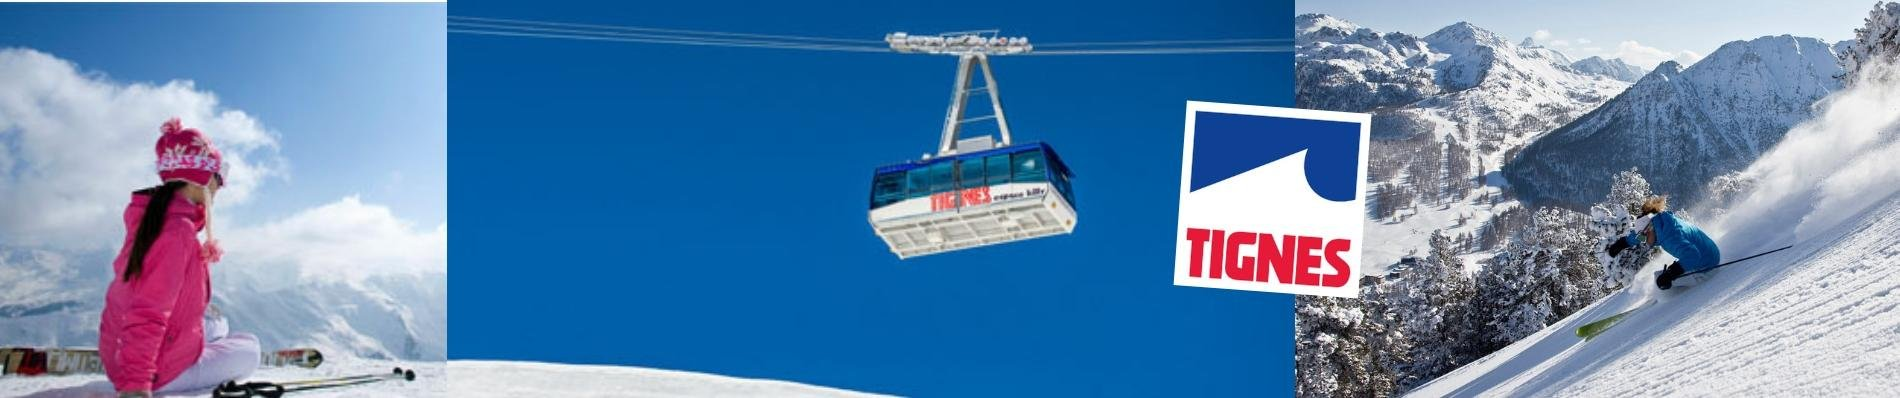 tignes ski wintersport franse alpen